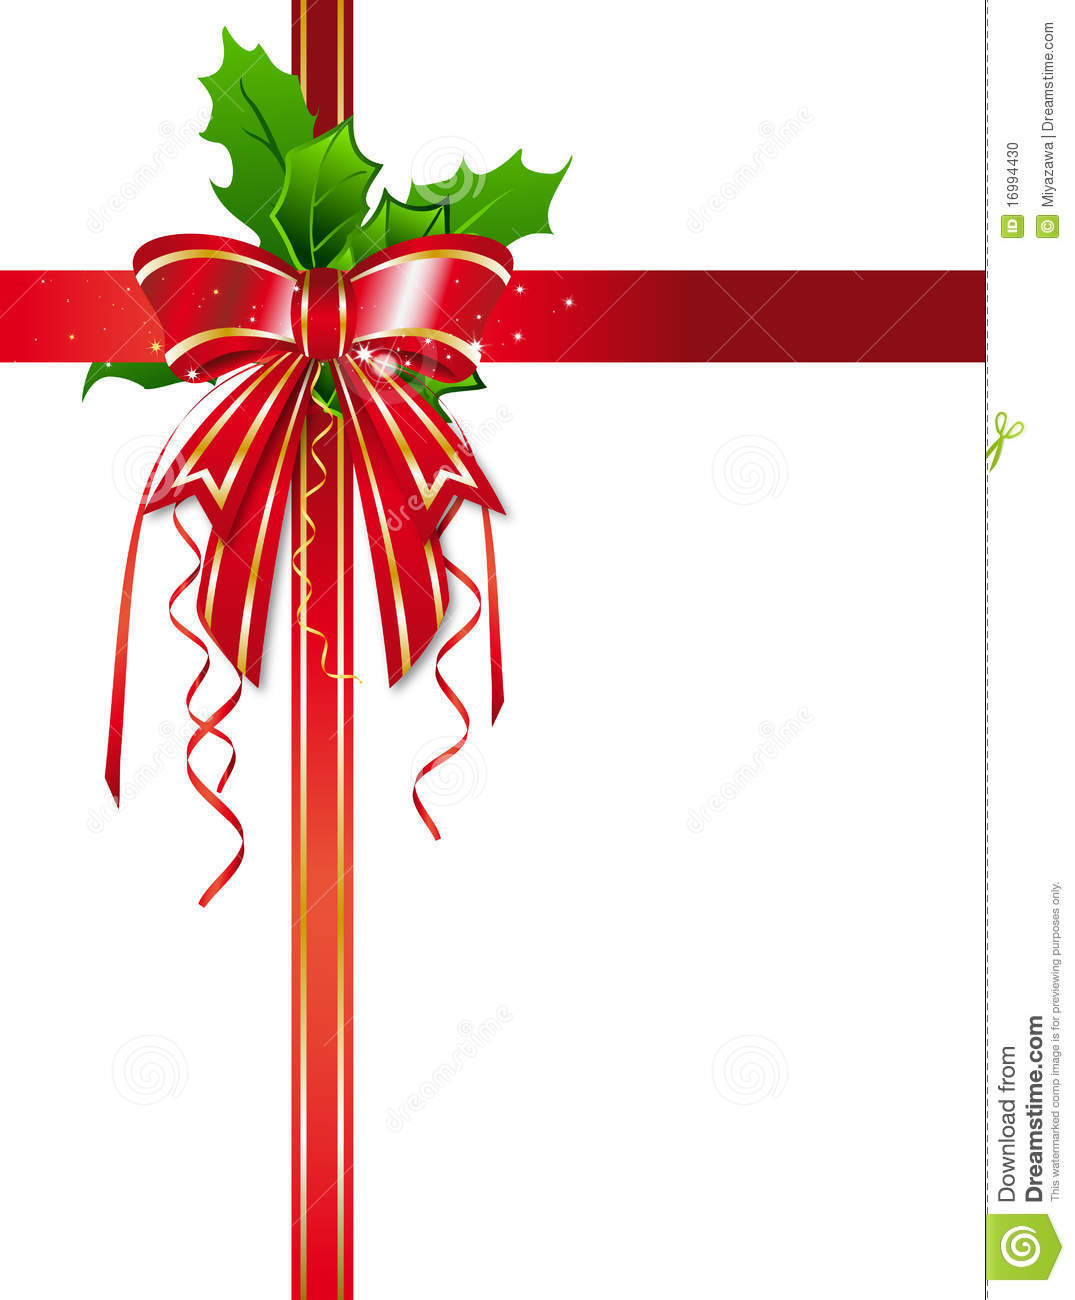 Christmas ribbon images clipart panda free clipart images